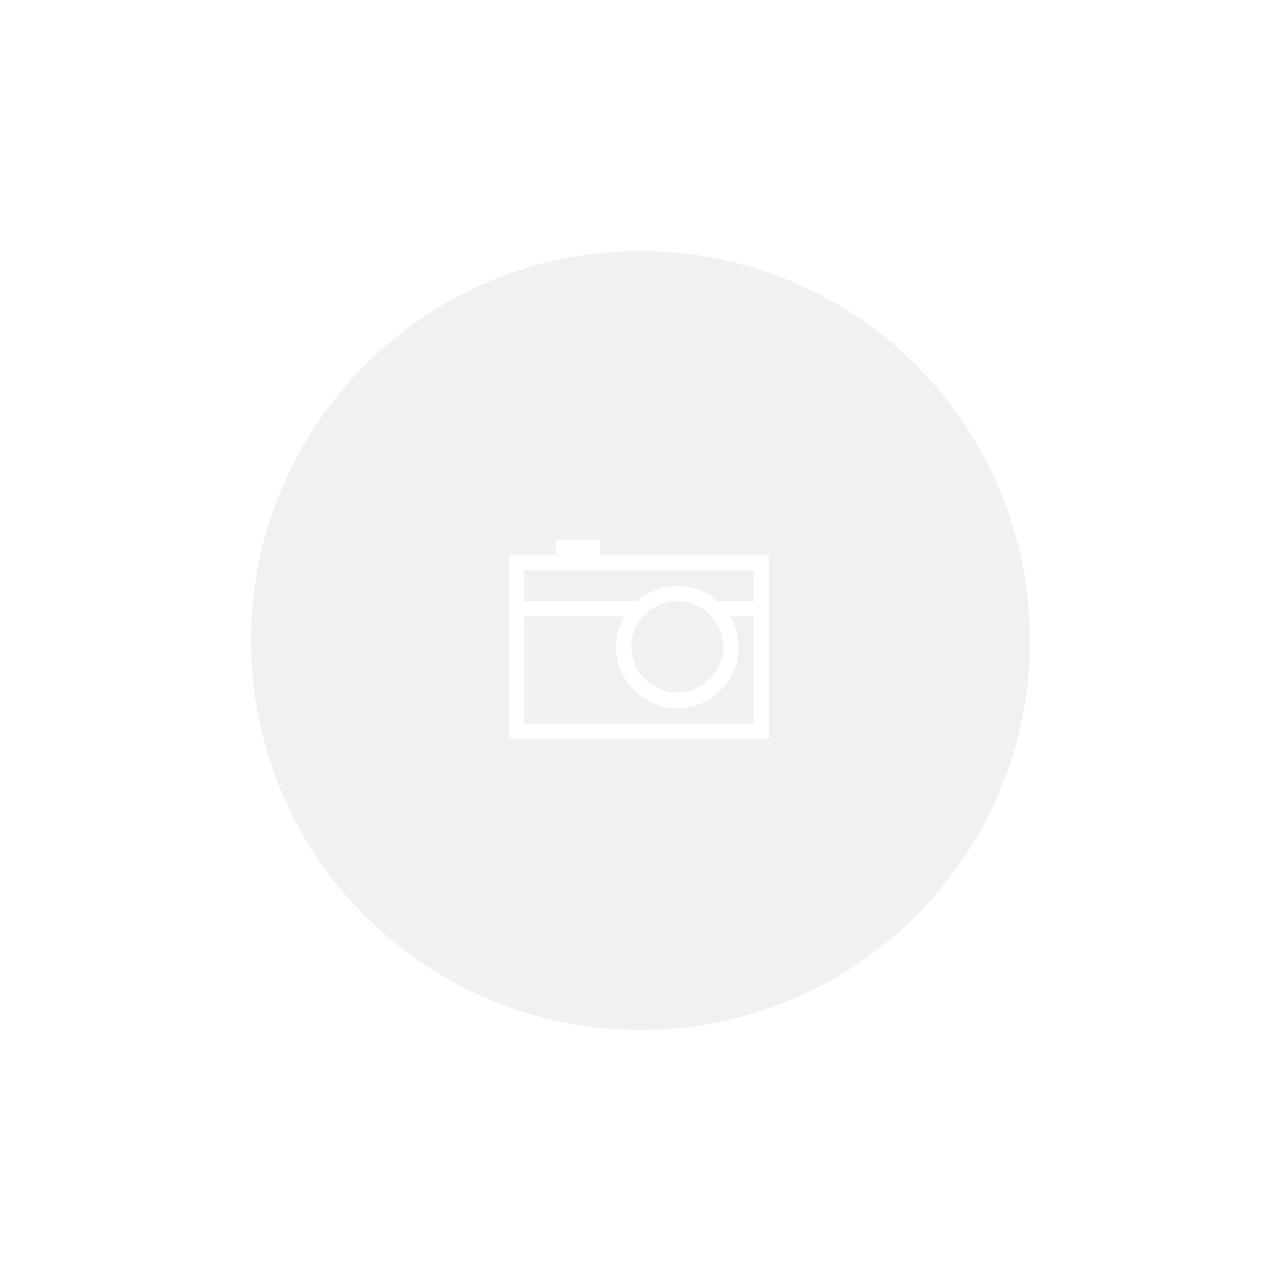 Kit de Lâminas de Tosa 08 Peças - Lâminas de Tosa Oster nº 40, 30, 15, 10, 7F, 4F, 3F + Estojo